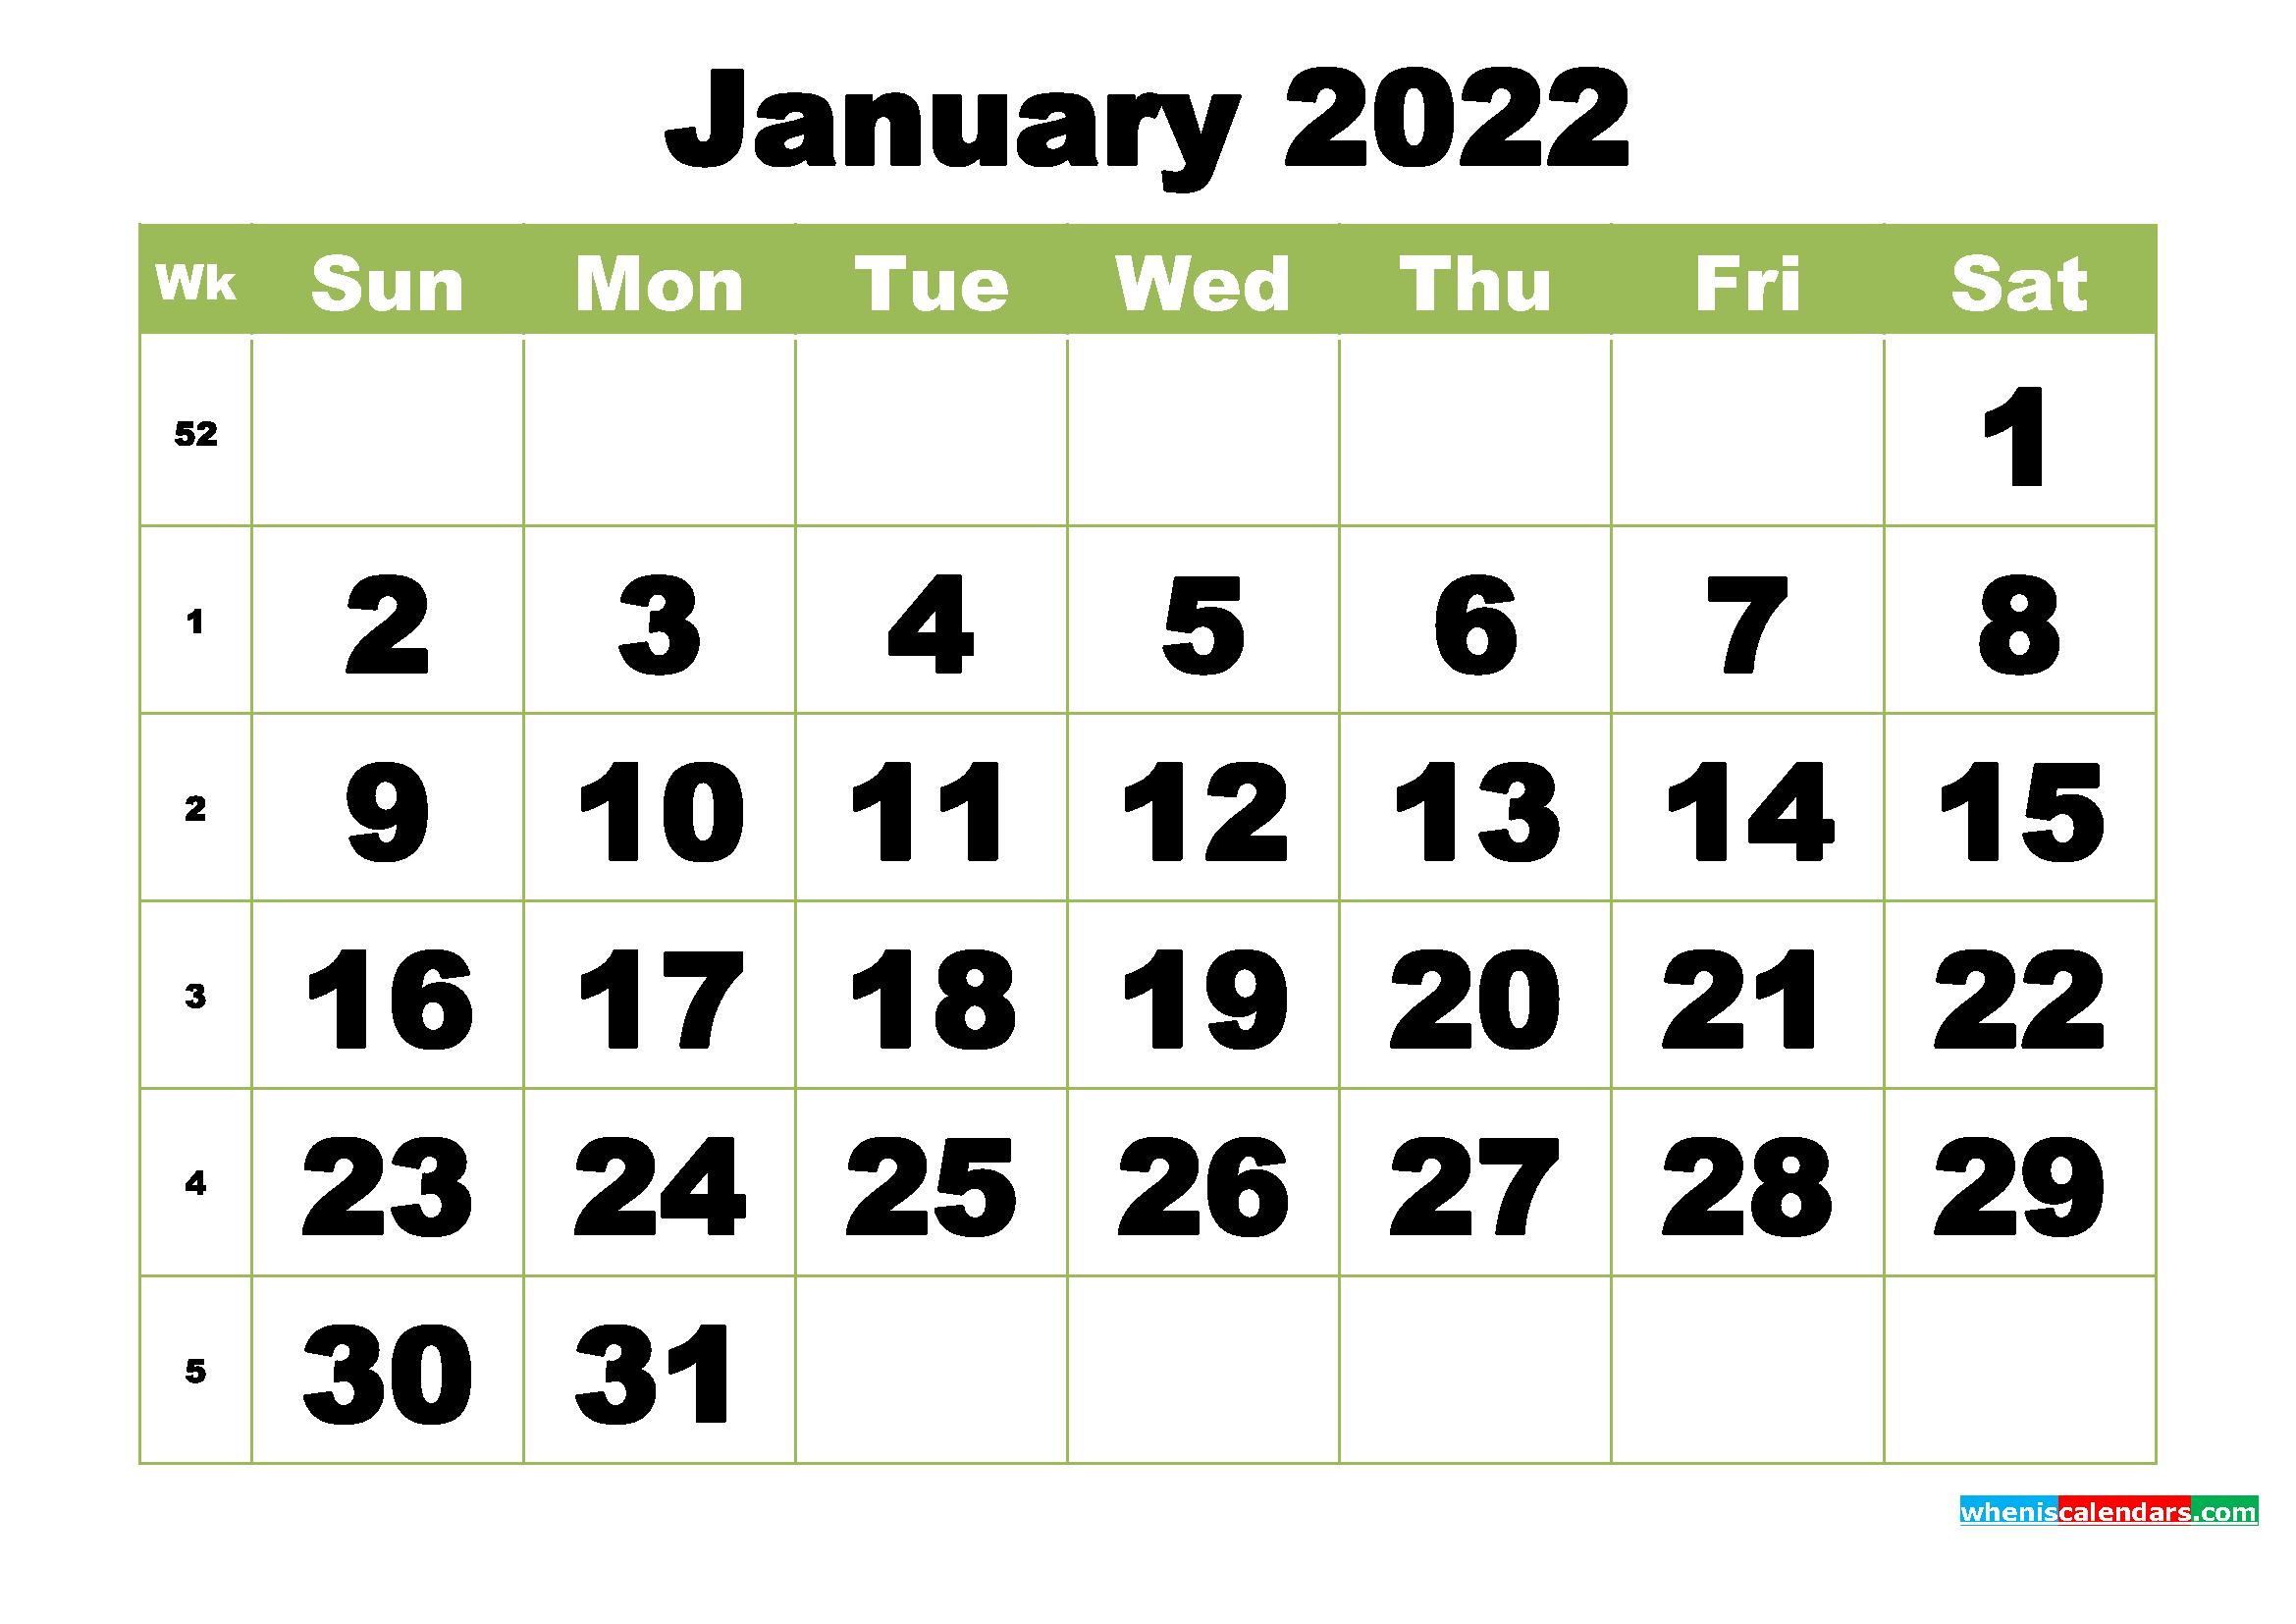 Free Printable Monthly Calendar January 2022 – Free Regarding Printable January 2022 Calendar